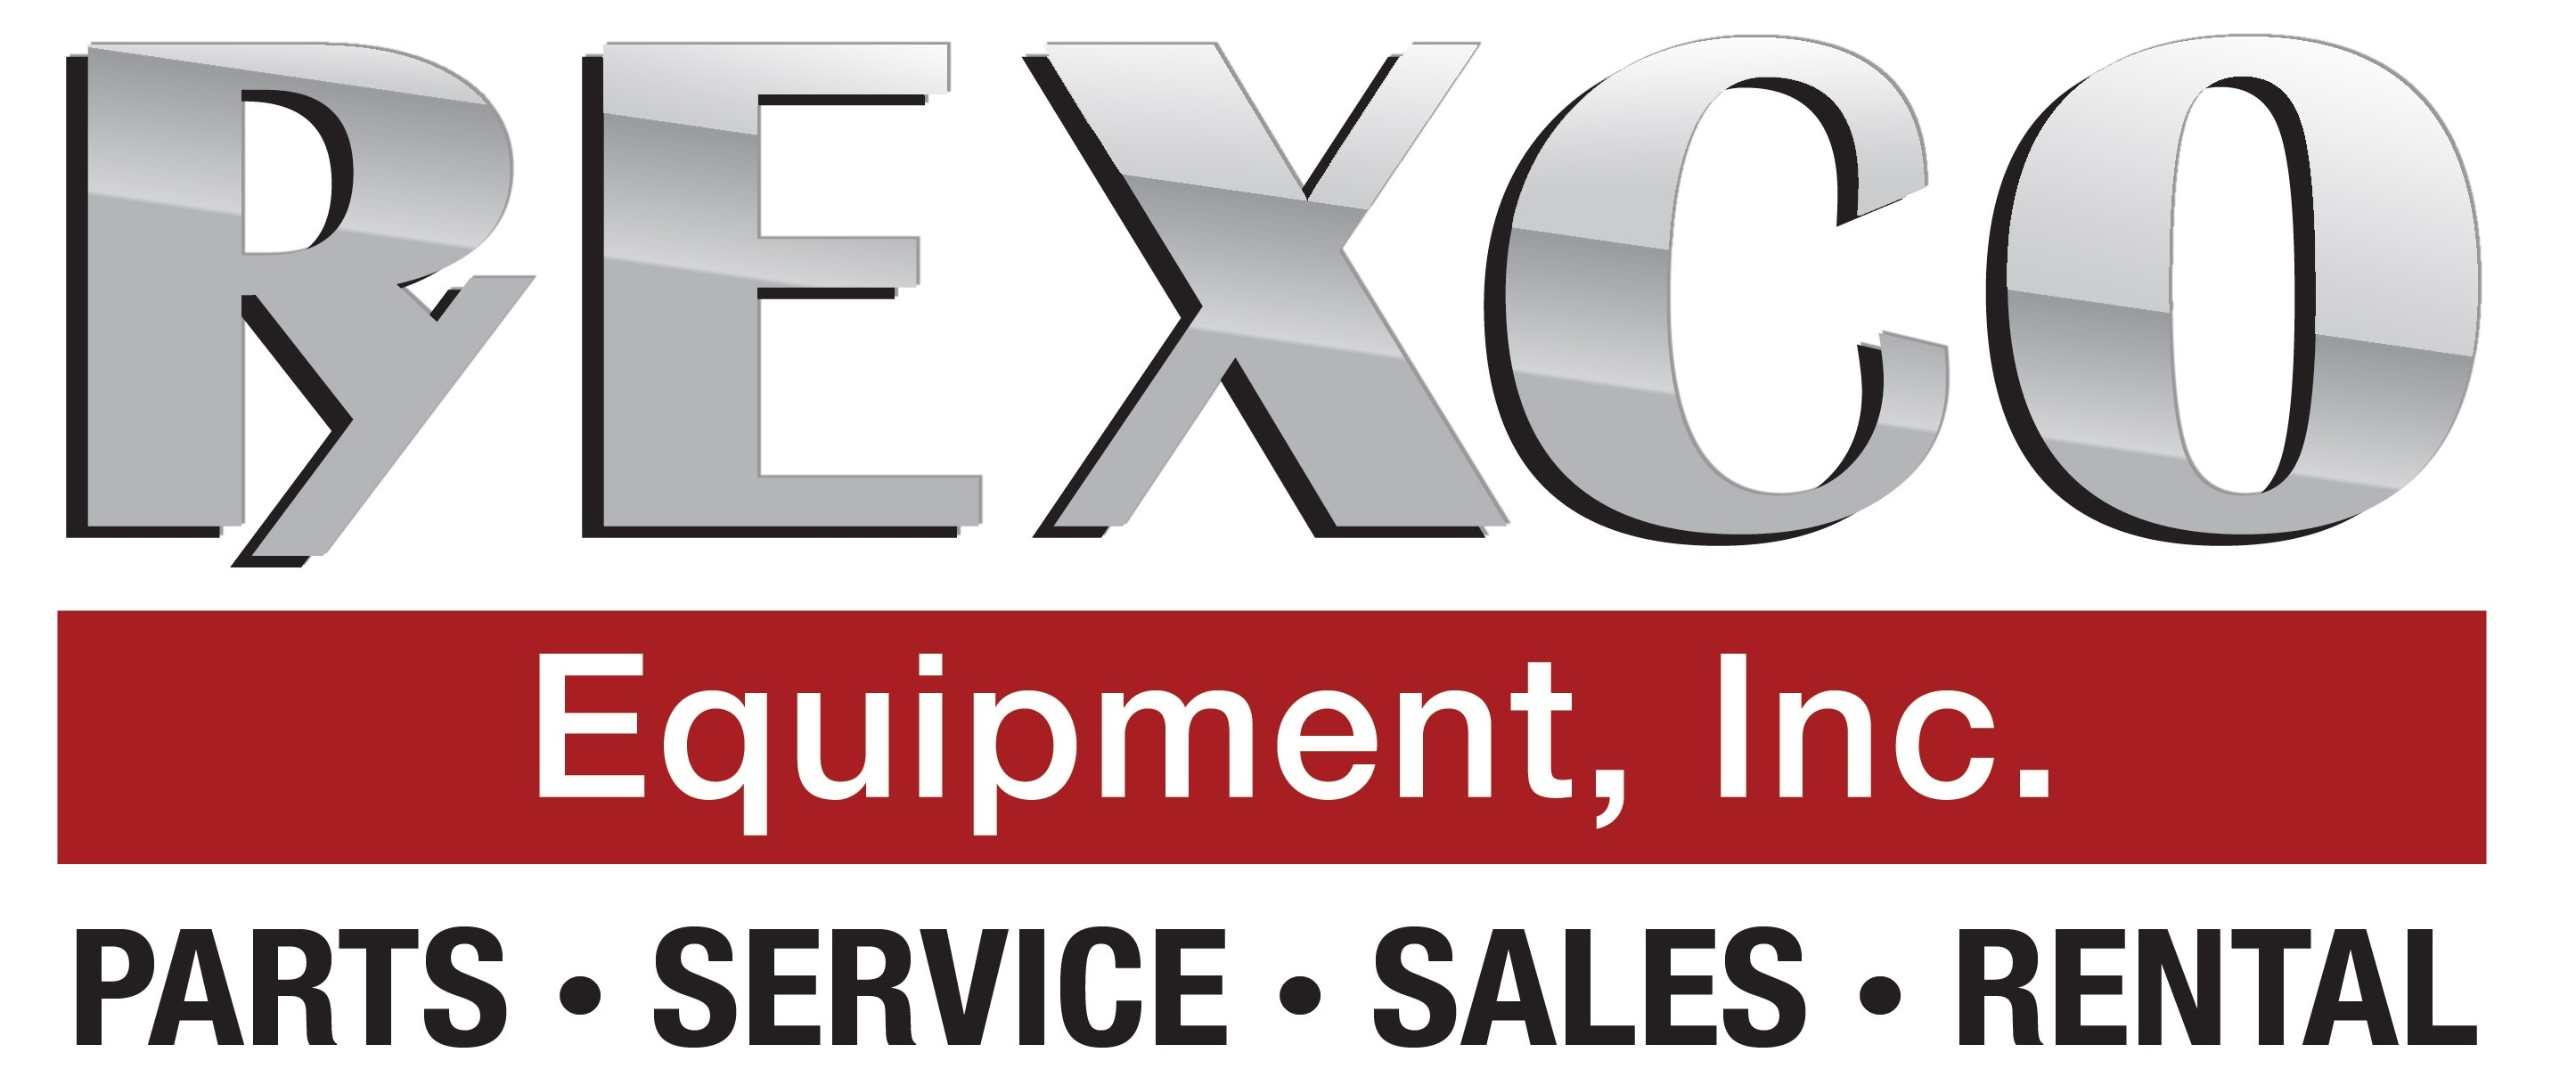 Rexco Equipment company logo